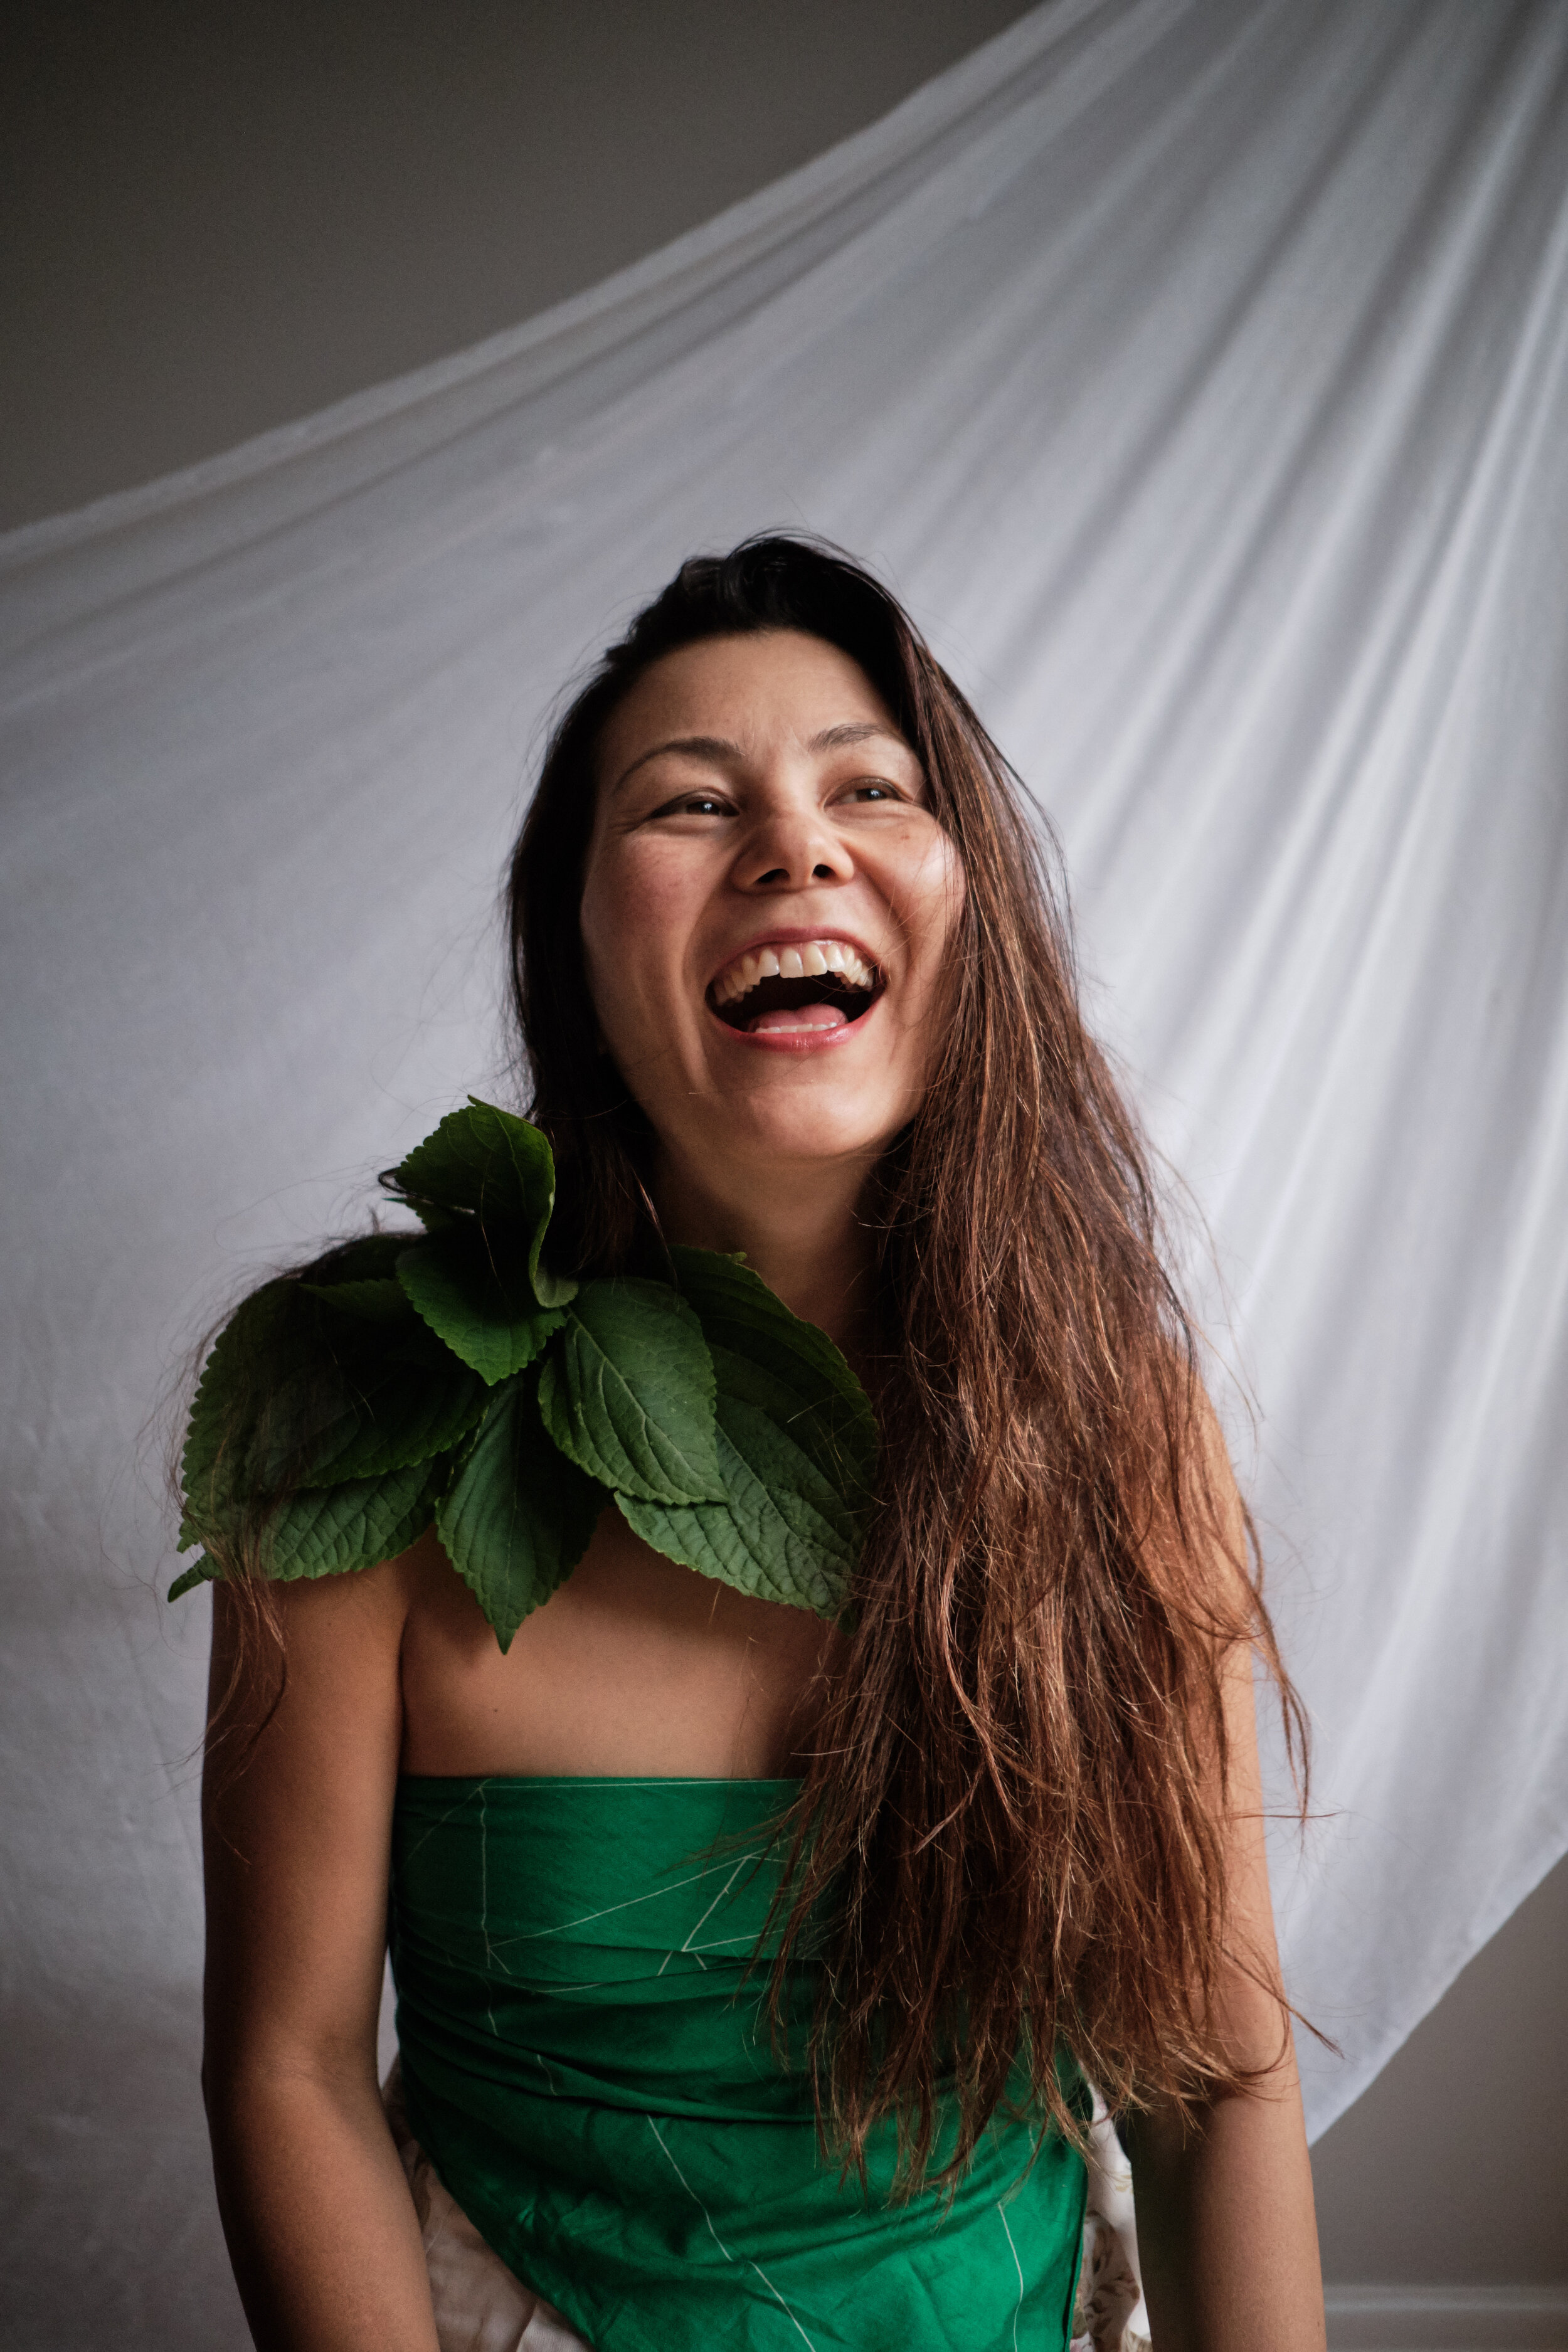 Shiso Delicious-photo by Caro Llamusi Silbermann-2019-09-hires2.jpg